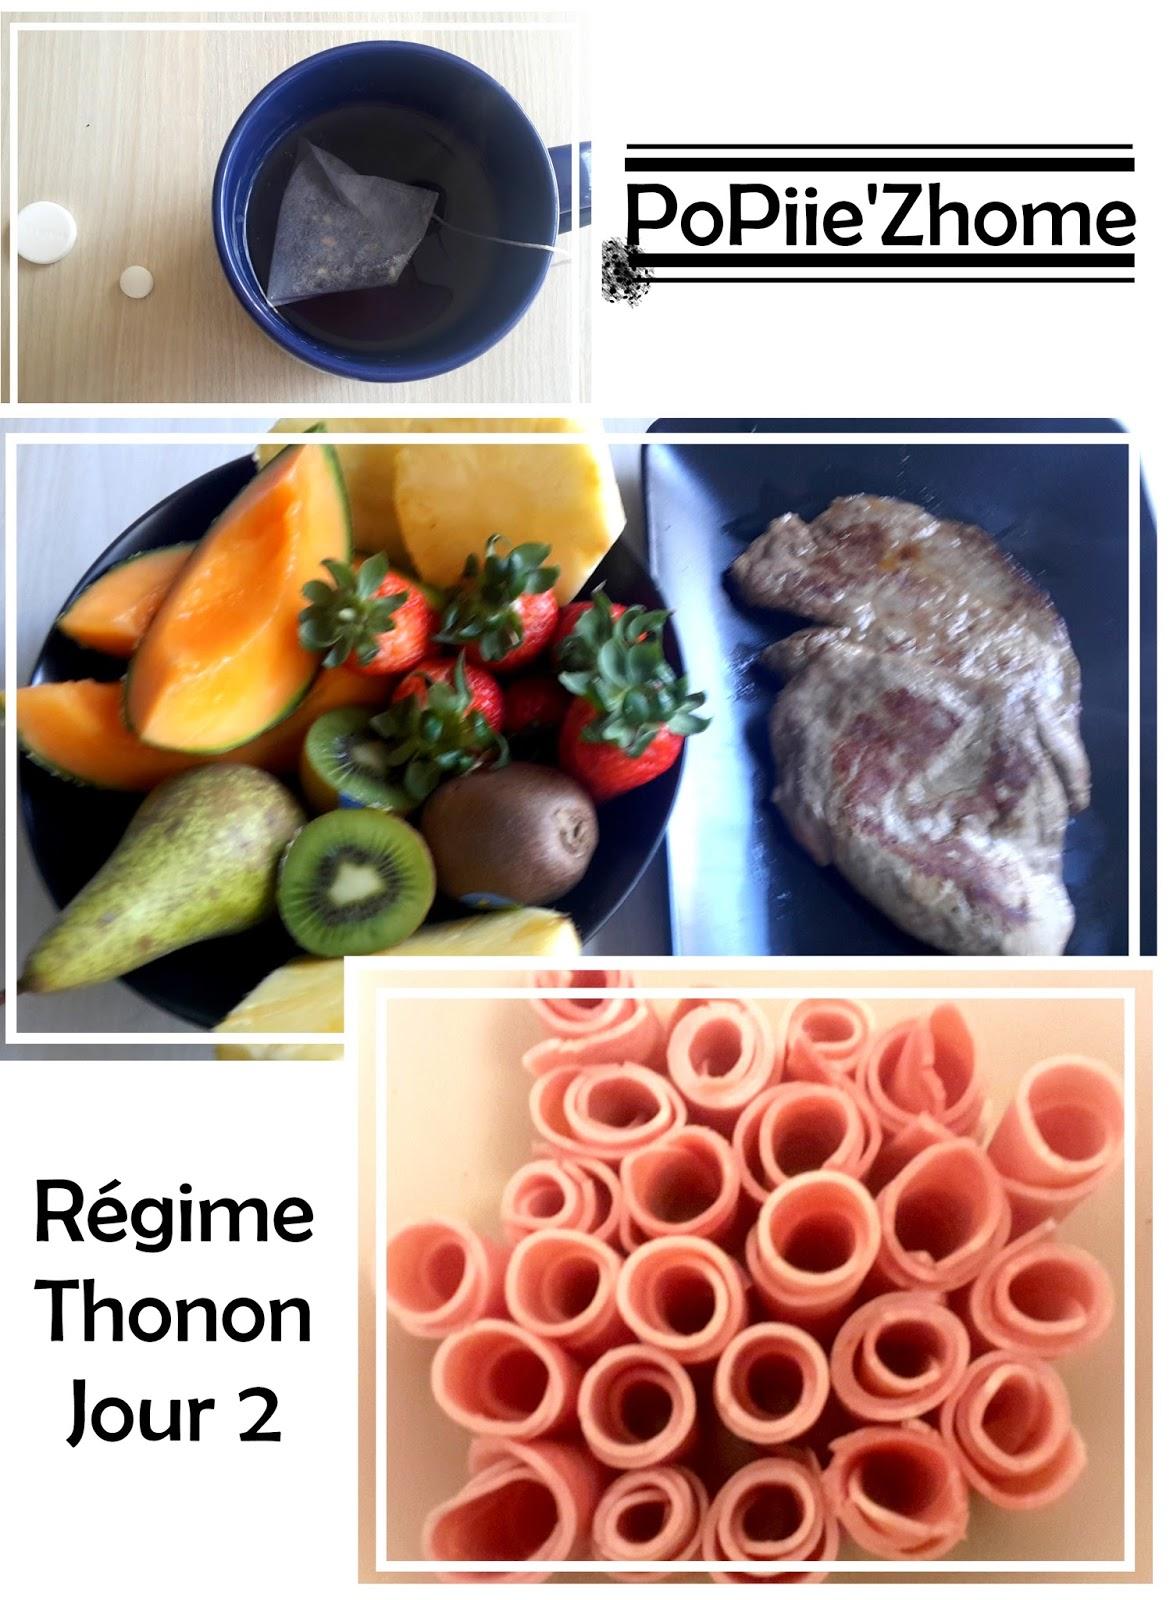 Popiie 39 z home for Ai cuisine thonon